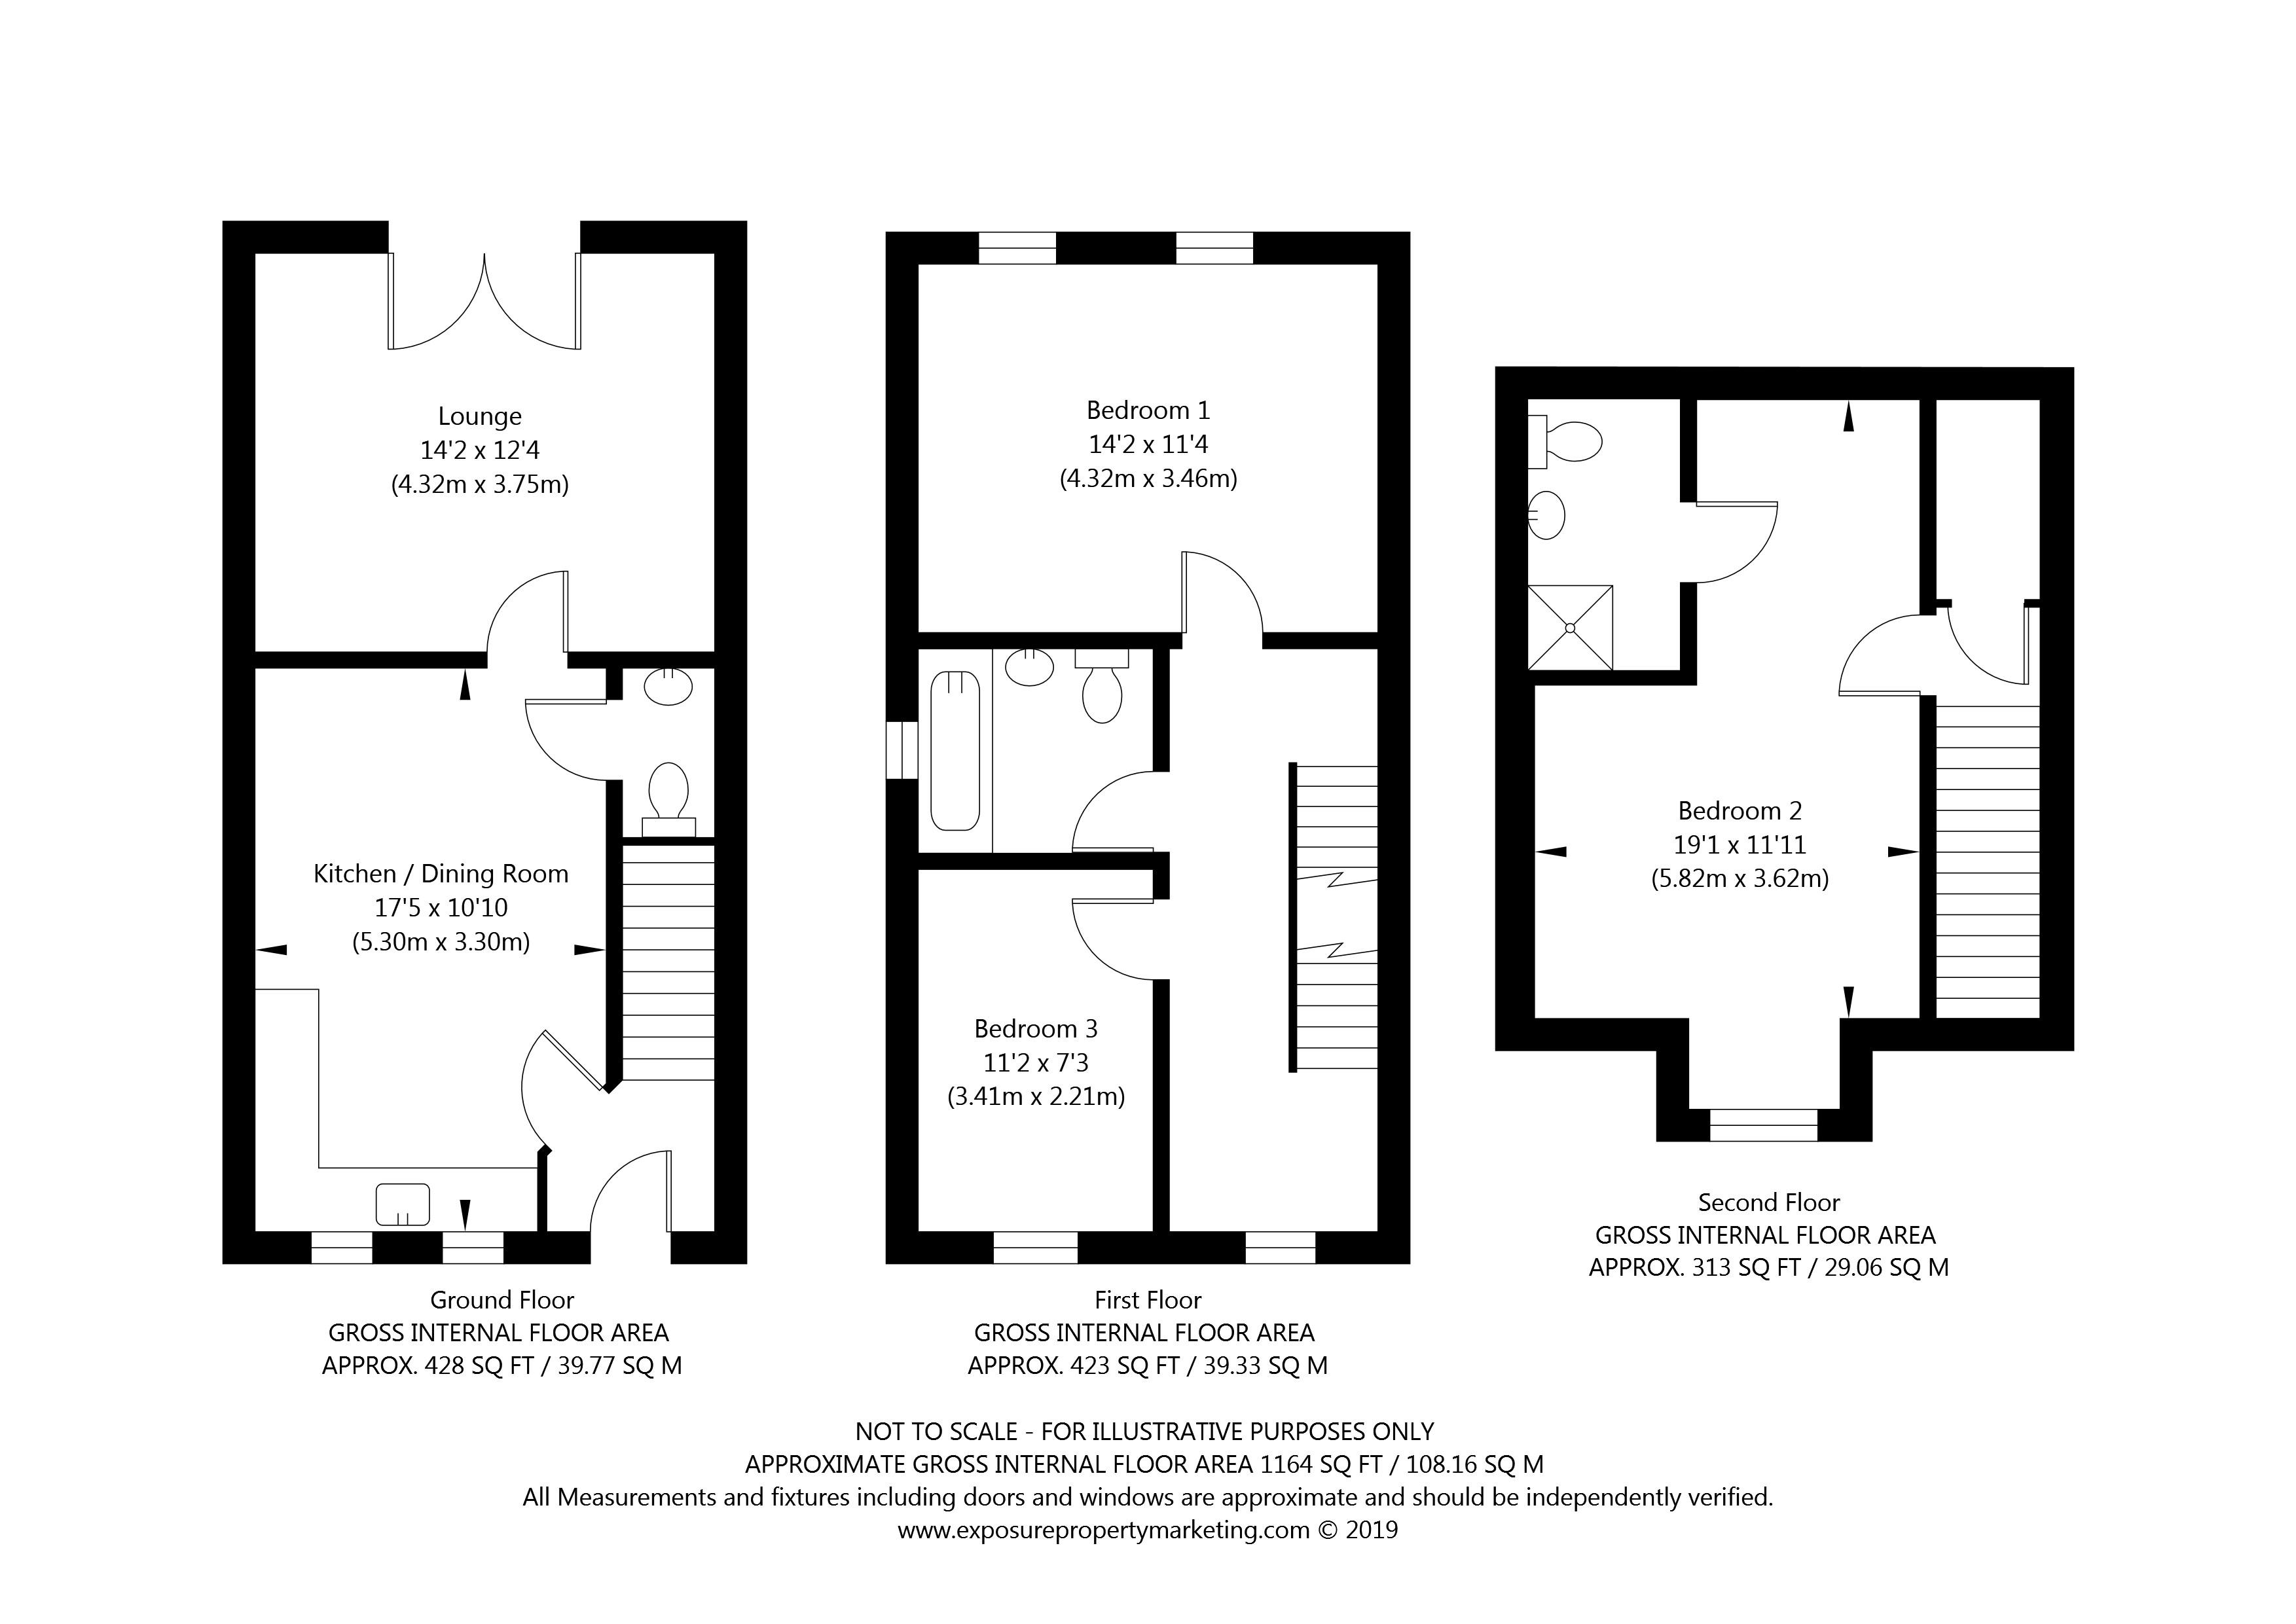 The Cranswick Plot 7 Woldgate Pastures, Kilham, York property floorplan